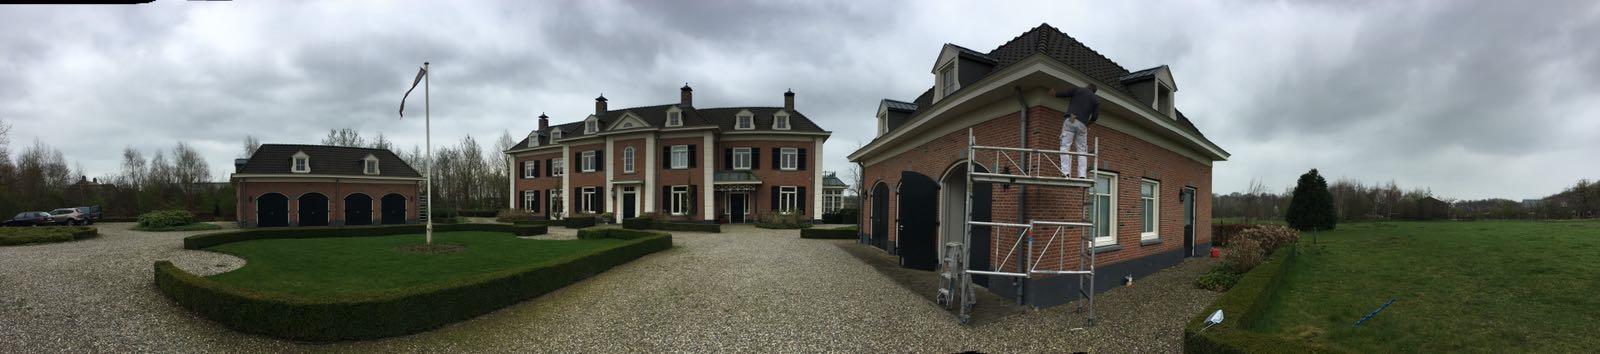 Landgoed in Gelderland